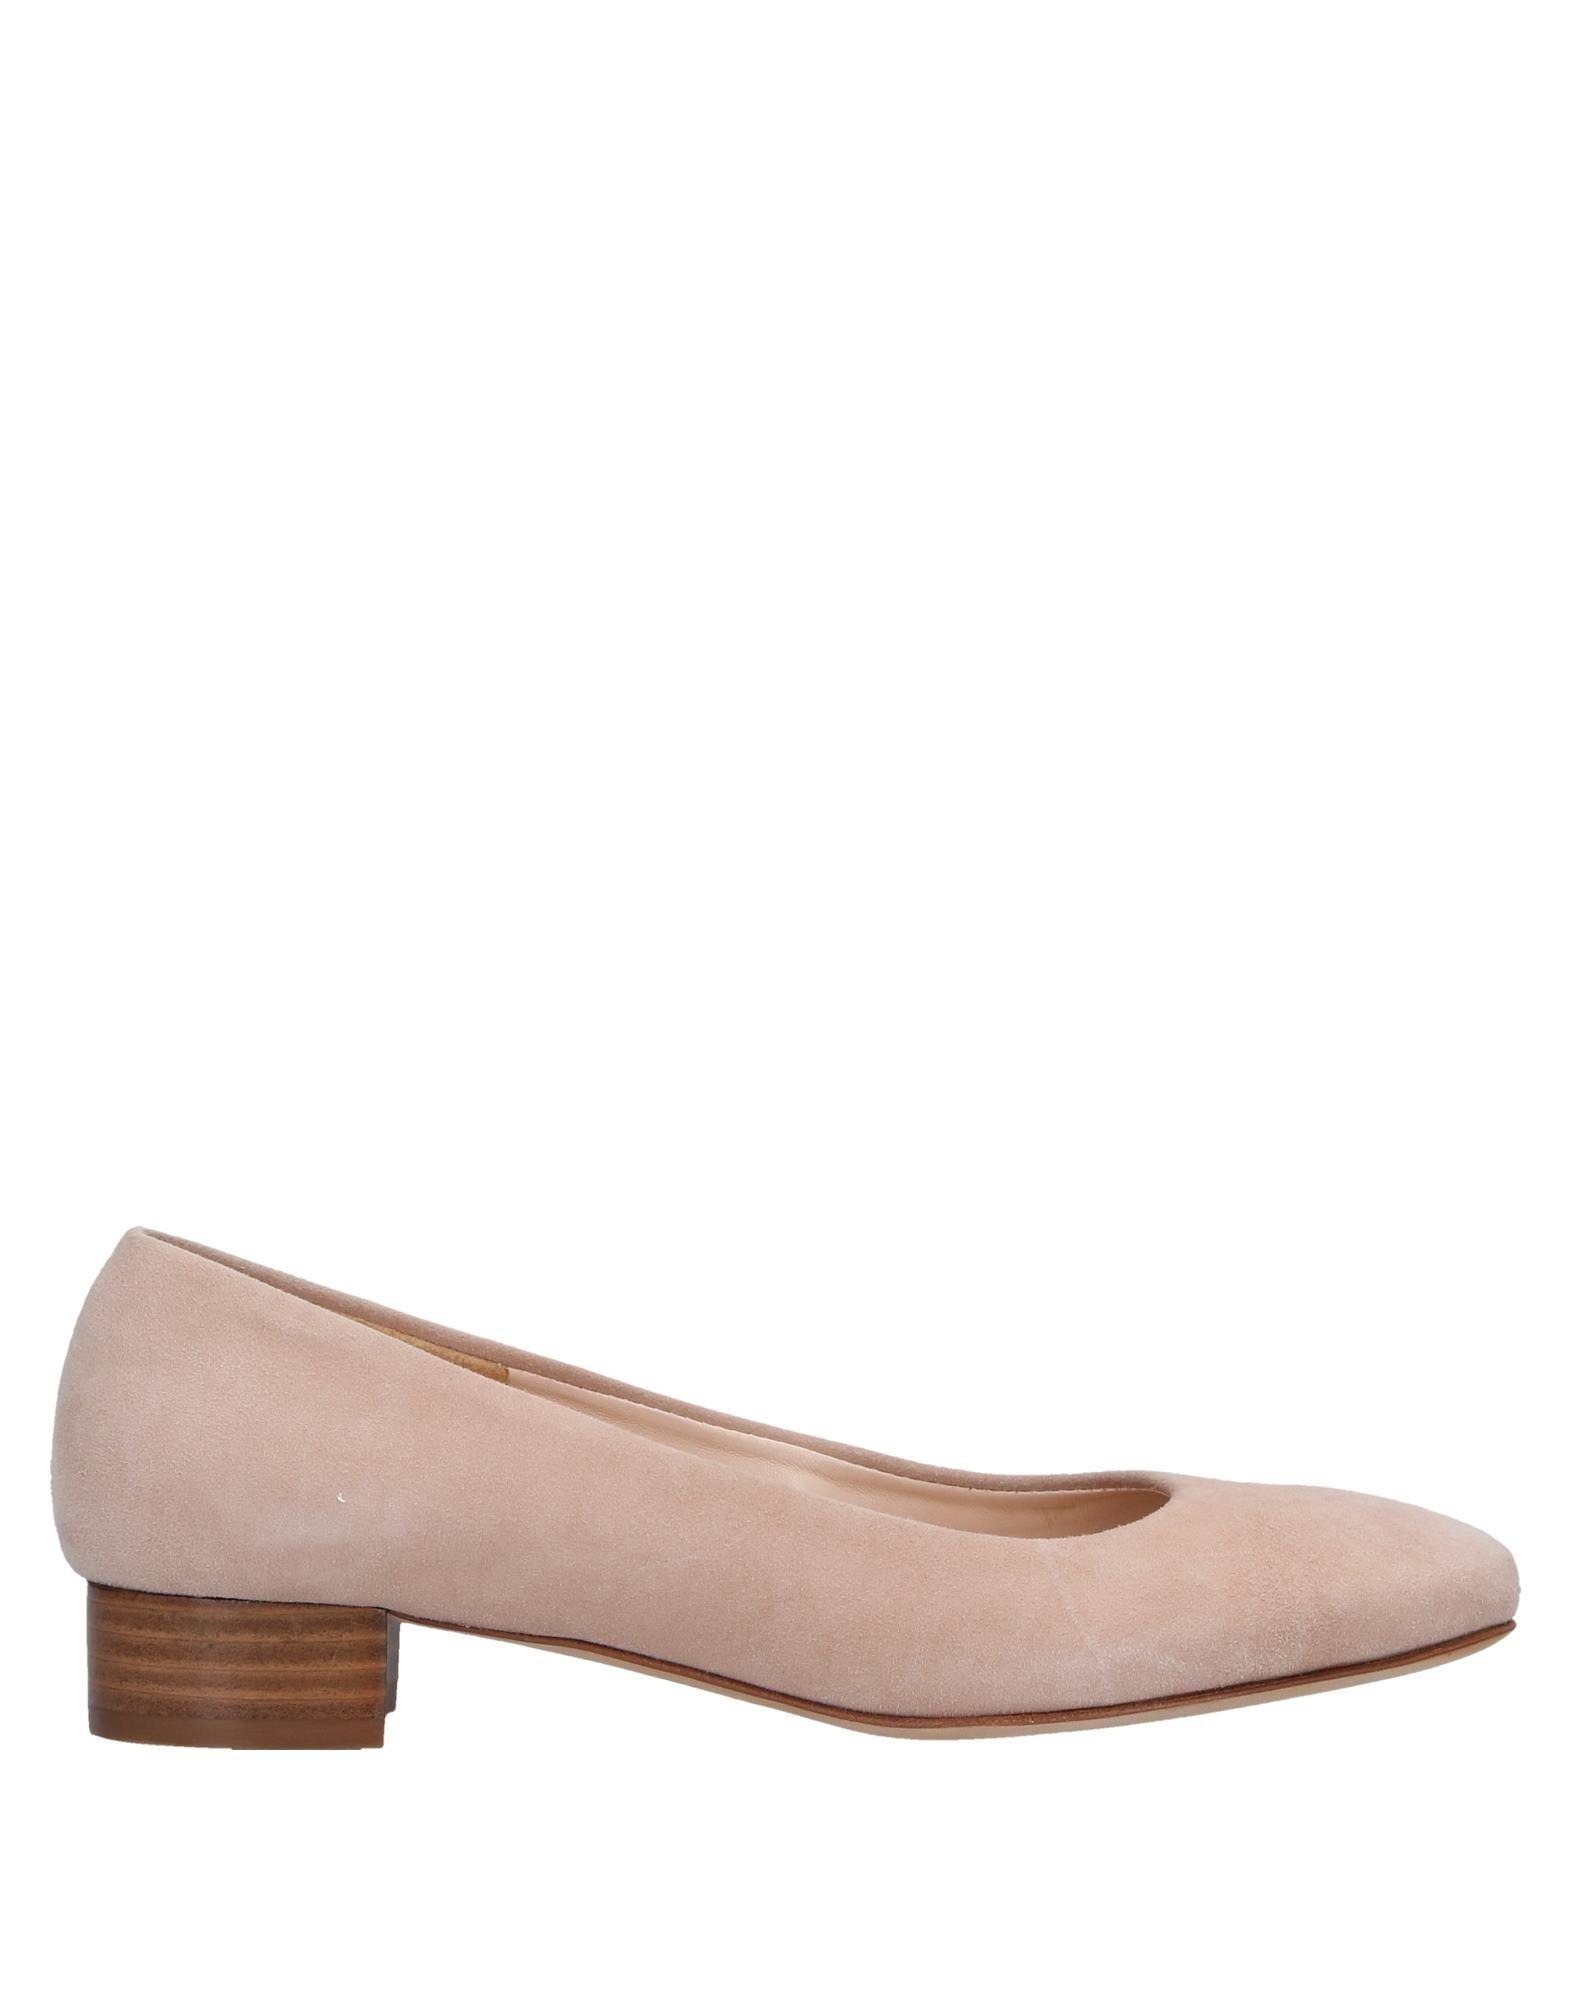 Florence Ballerinas Damen  11536532MP Gute Qualität beliebte Schuhe